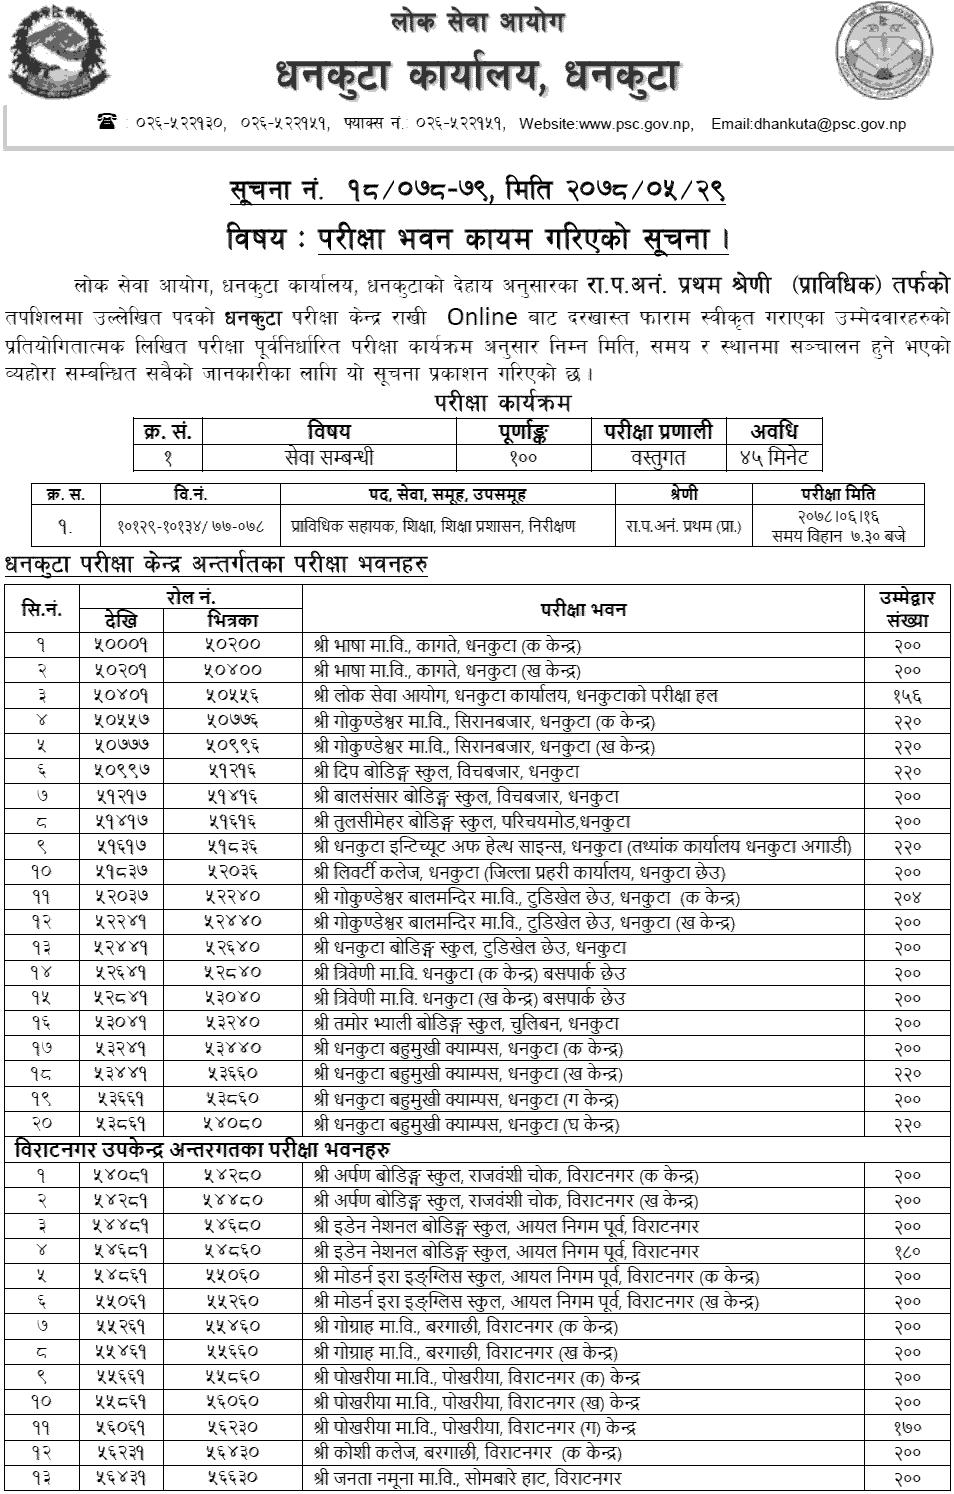 Lok Sewa Aayog Prabidhik Nayab Subba (Nasu) Exam Center Dhankuta